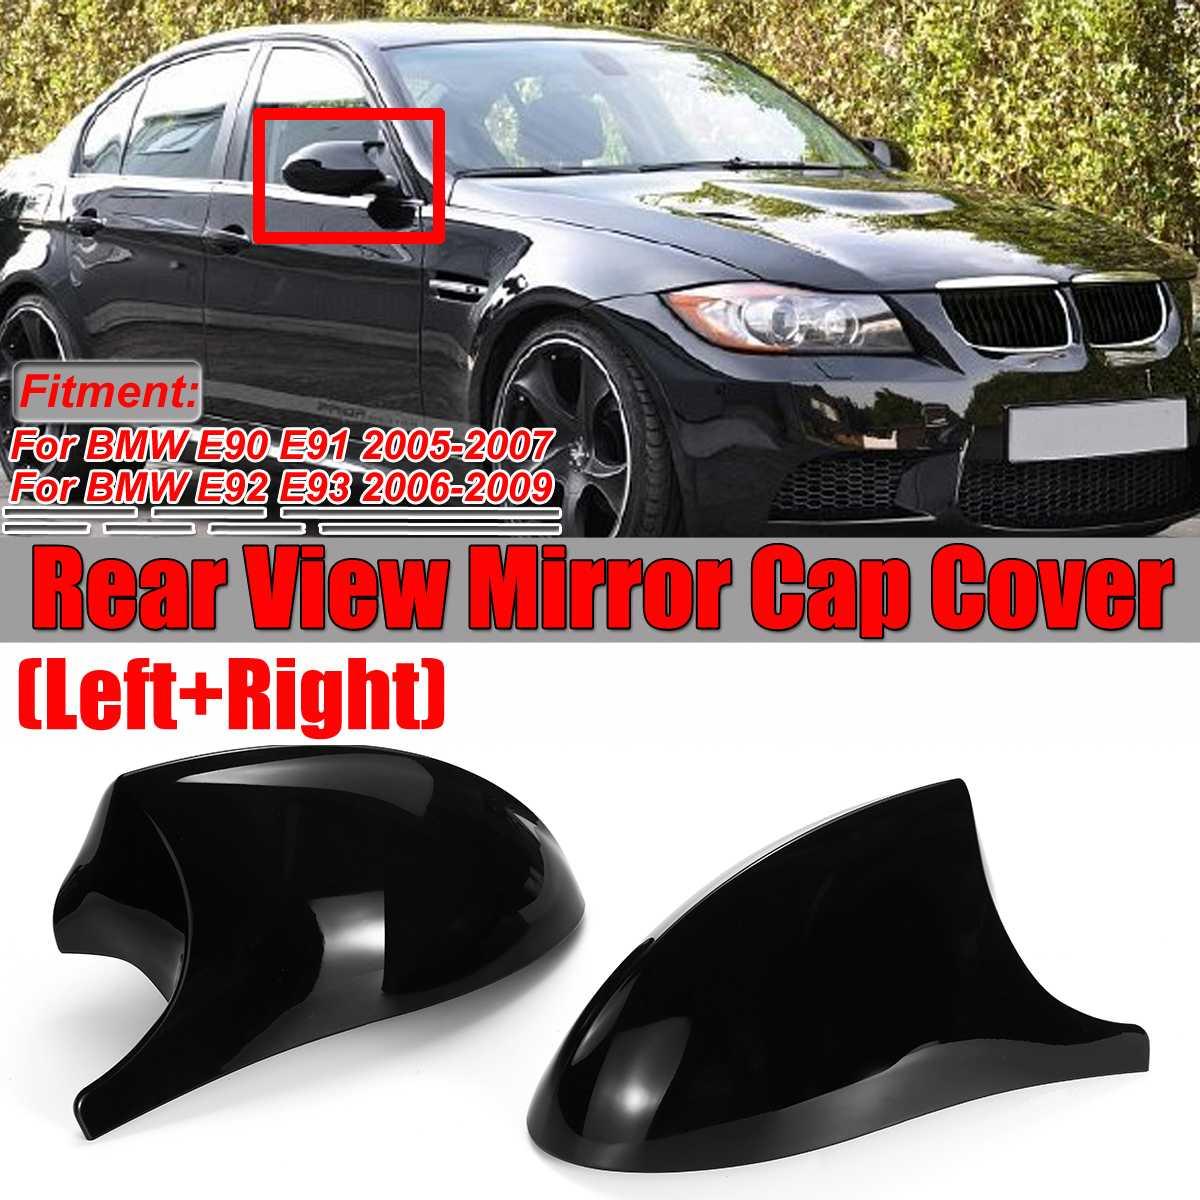 2x ريال ألياف الكربون/ABS مرآة غطاء E90 سيارة الجانب الرؤية الخلفية غطاء مرآة جانبية غطاء لسيارات BMW E90 E91 E92 E93 M3 نمط E80 E81 E87